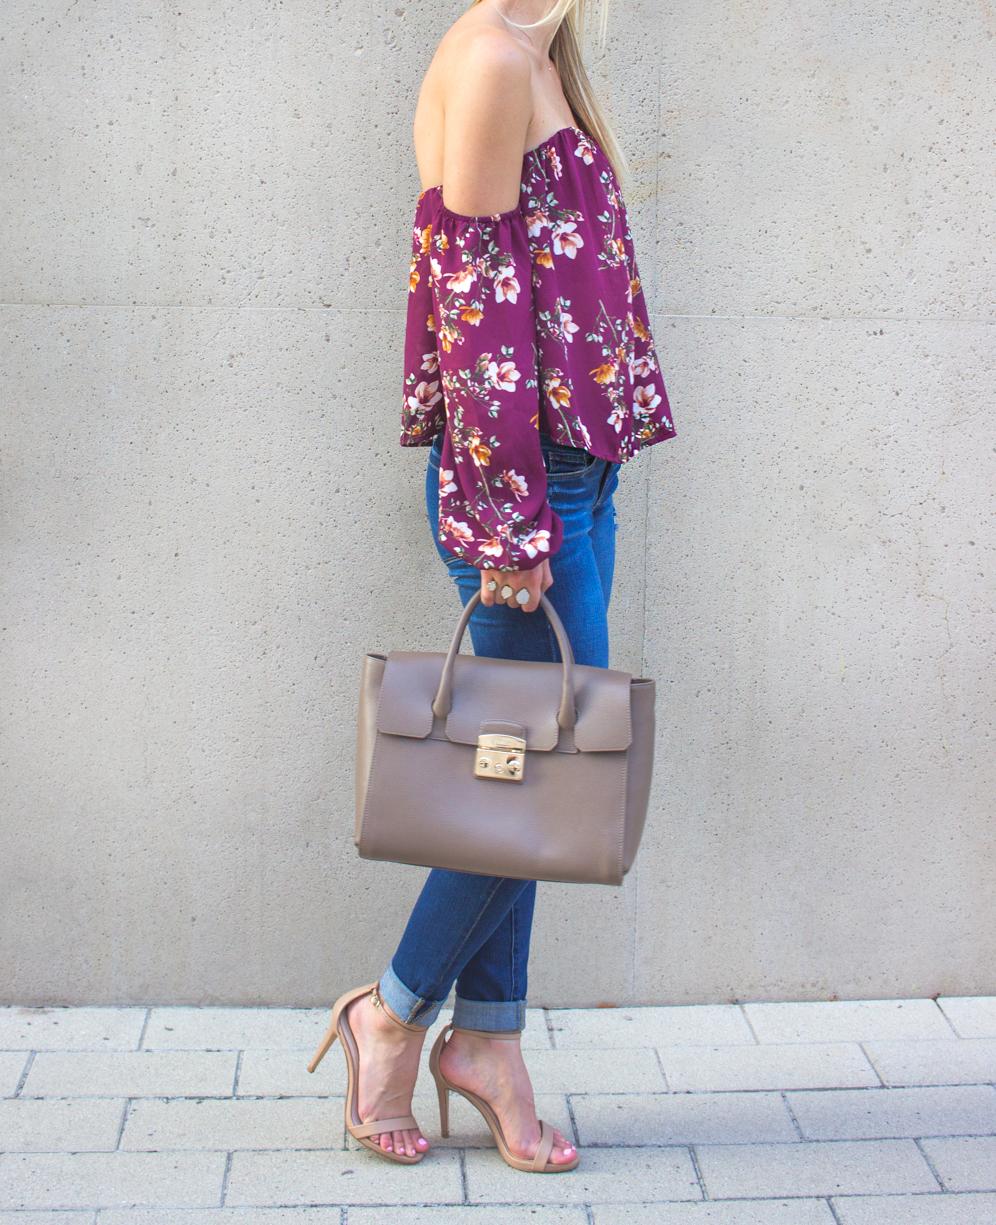 livvyland-blog-olivia-watson-austin-texas-fashion-blogger-off-shoulder-boustier-top-4si3nna-floral-blank-nyc-nordstrom-skinny-jeans-2